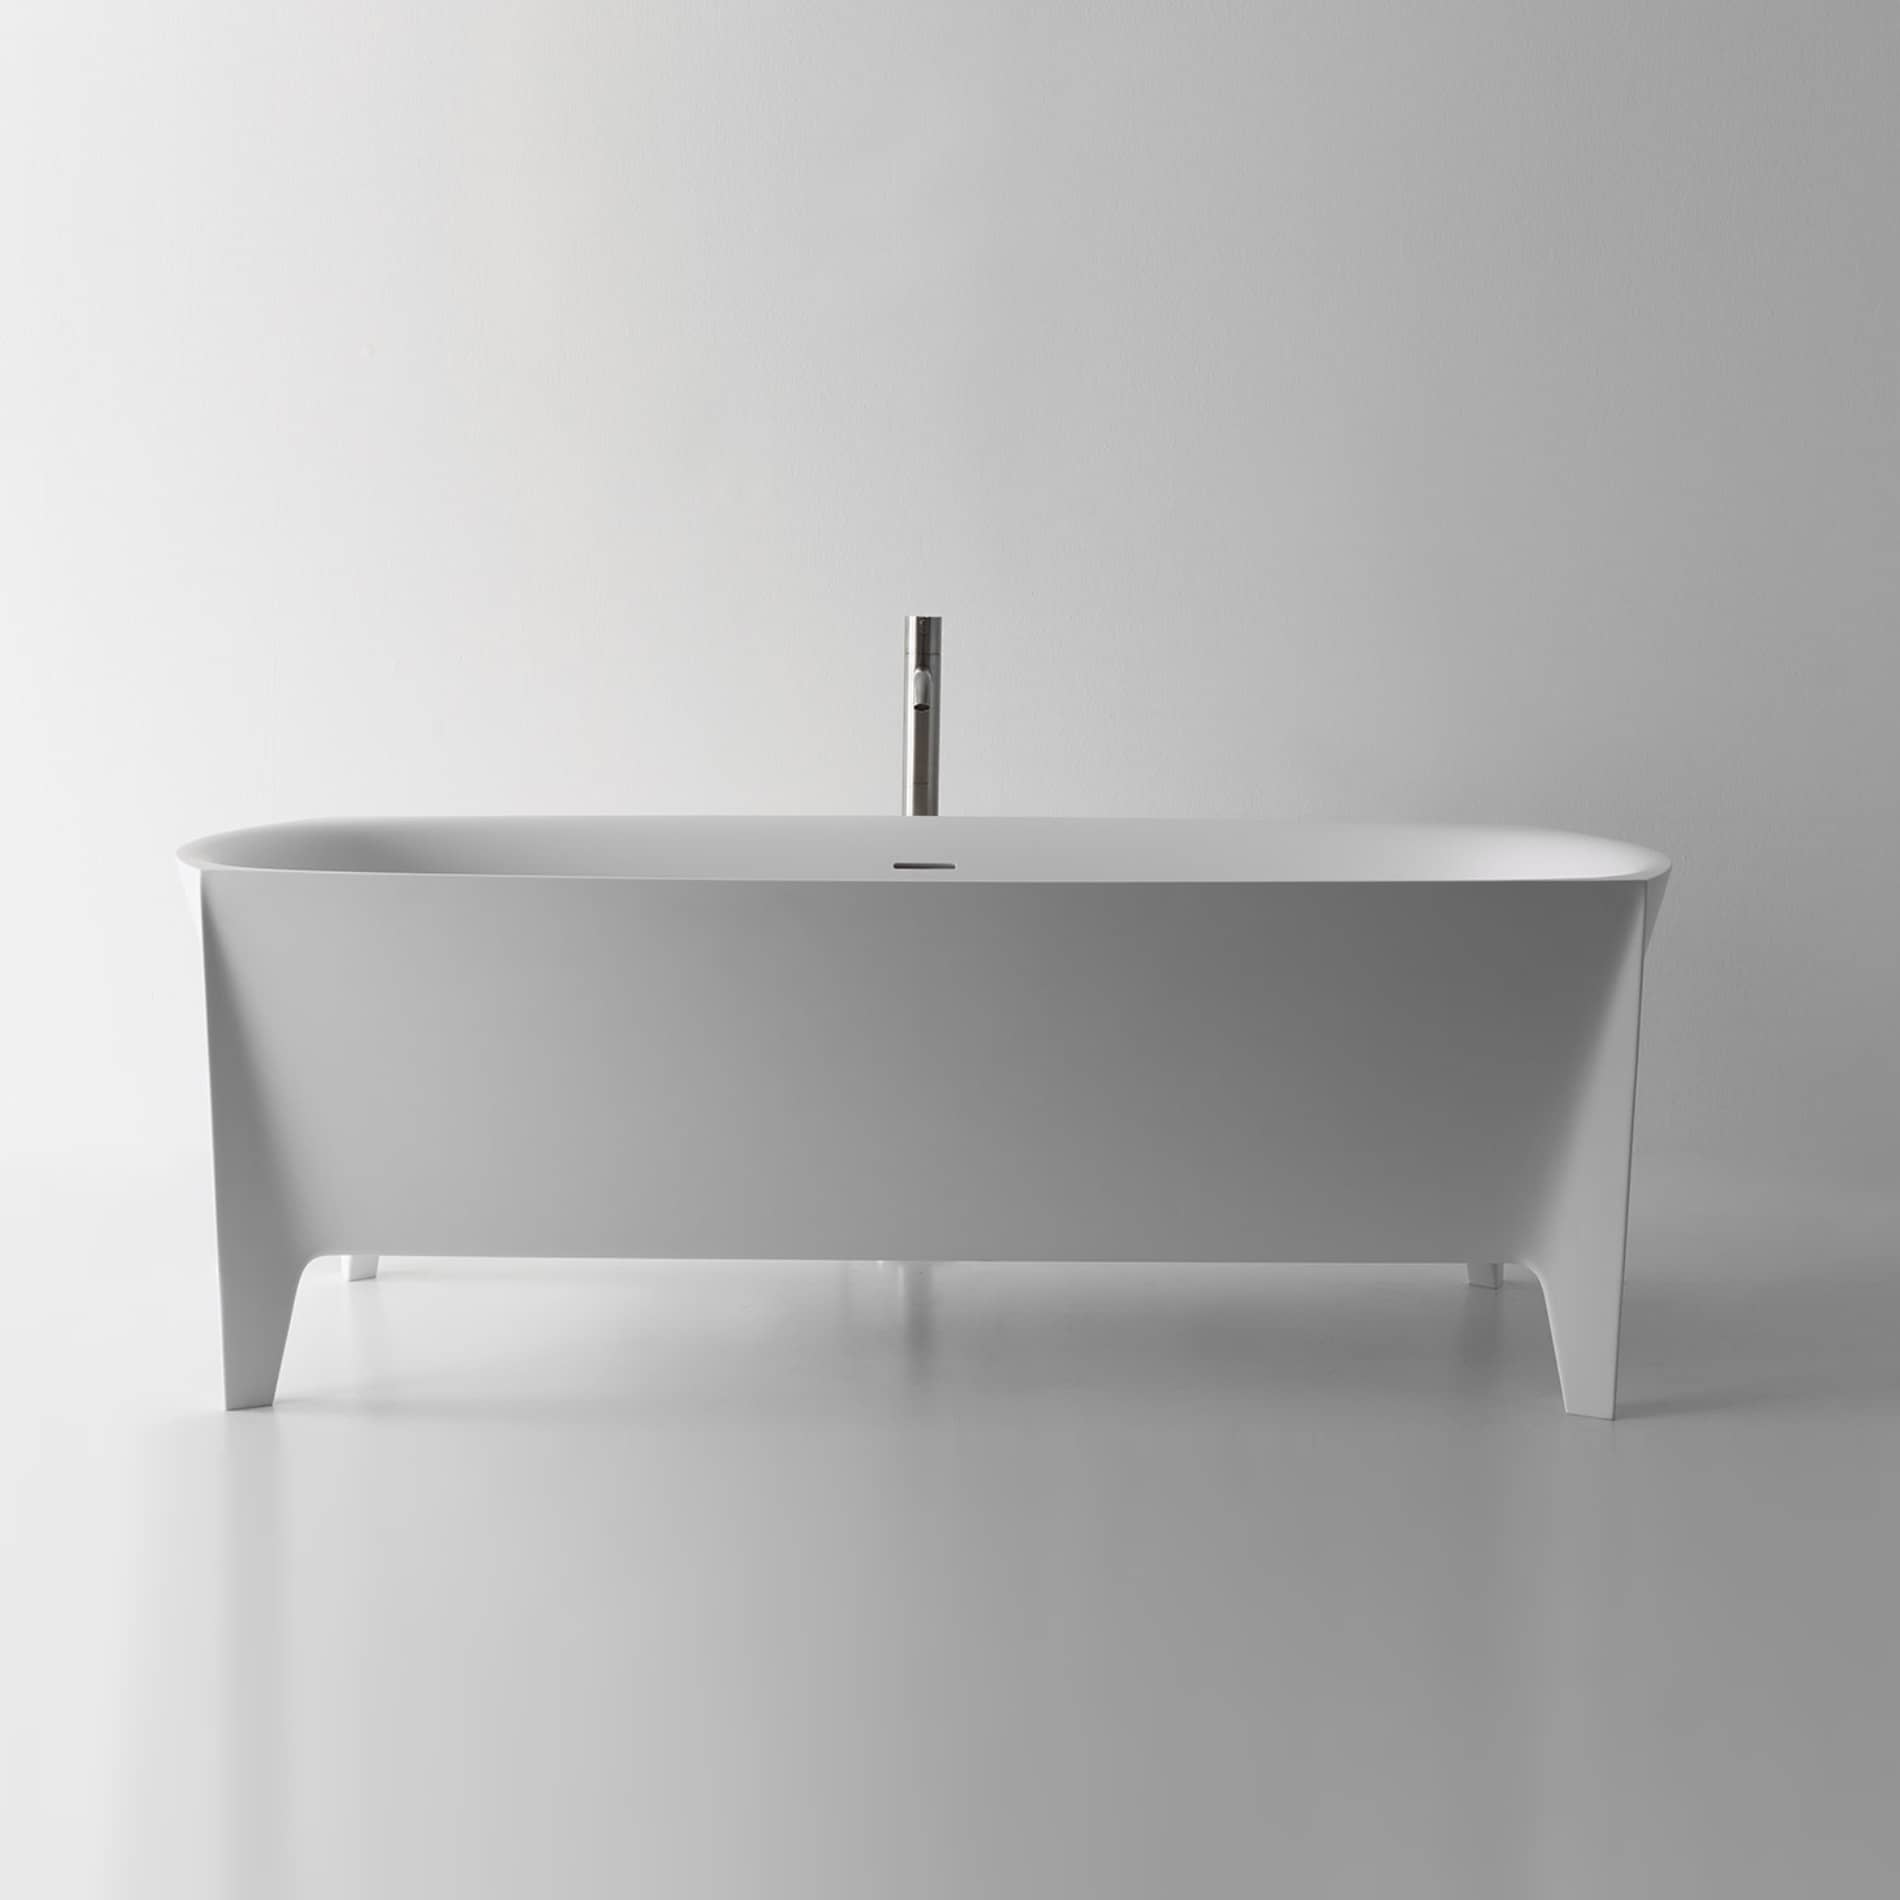 Cristalplant-products-Antoniolupi-tub-3